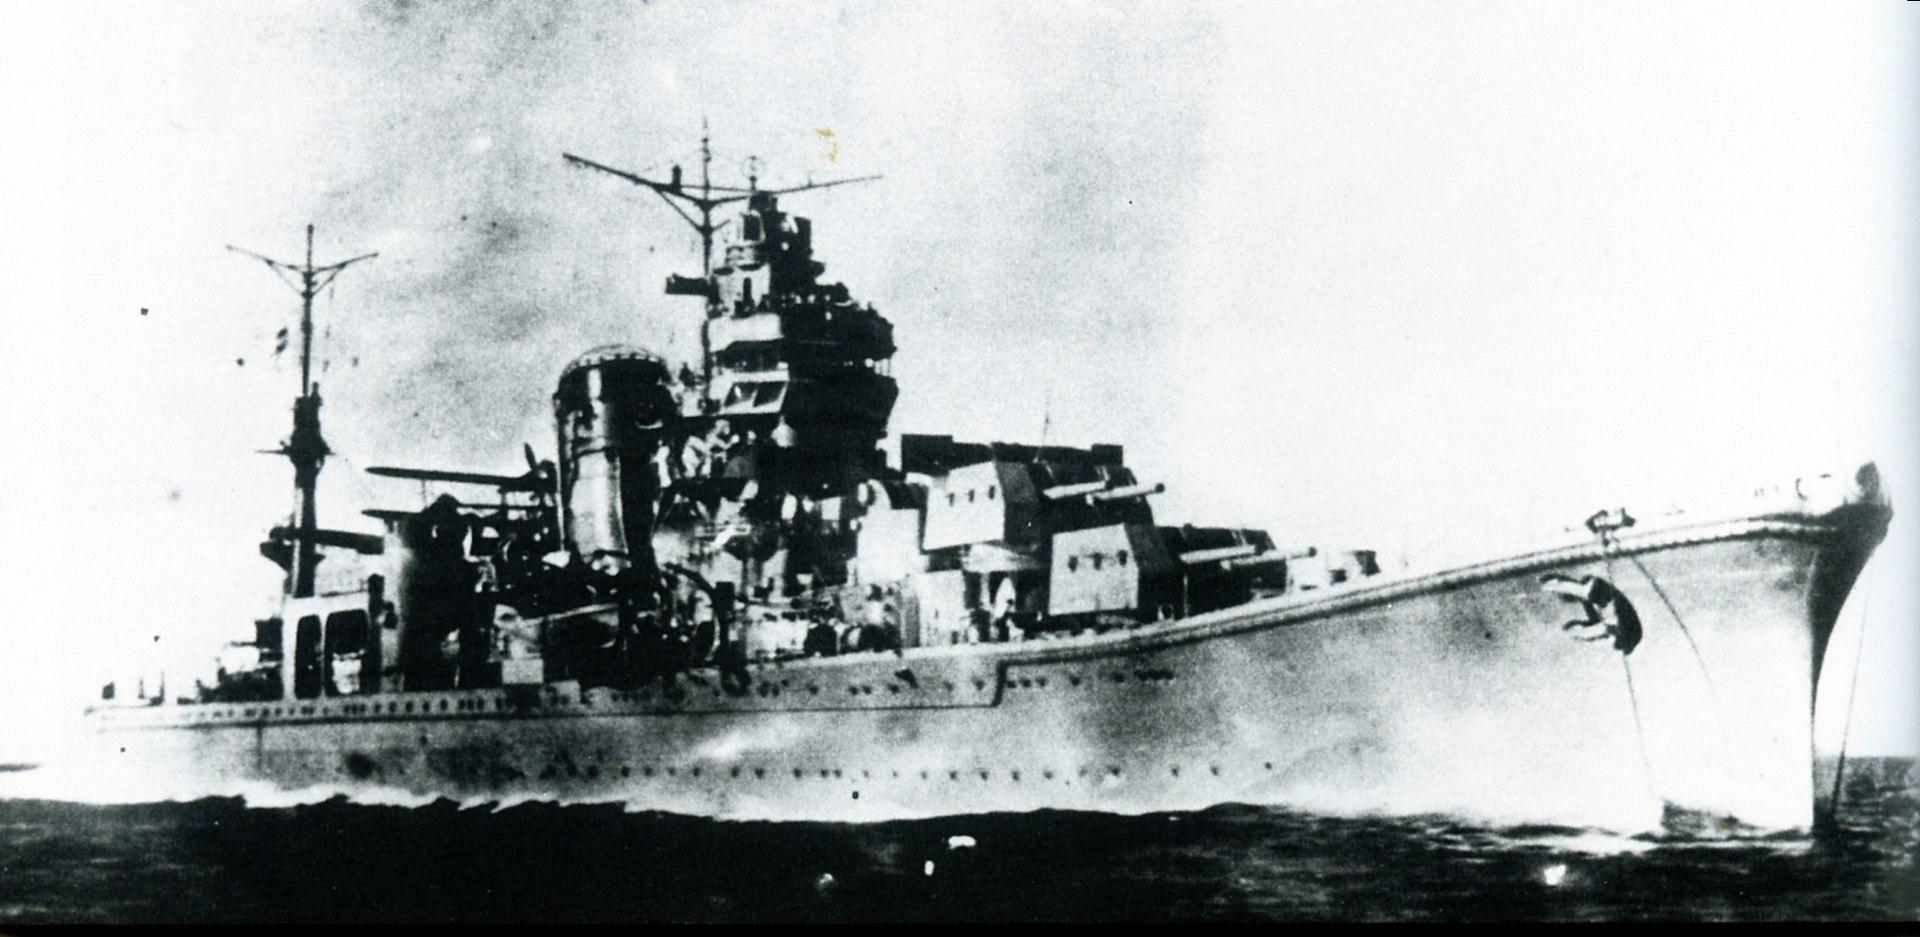 Warship - Agano - Cruiser - Light Cruiser